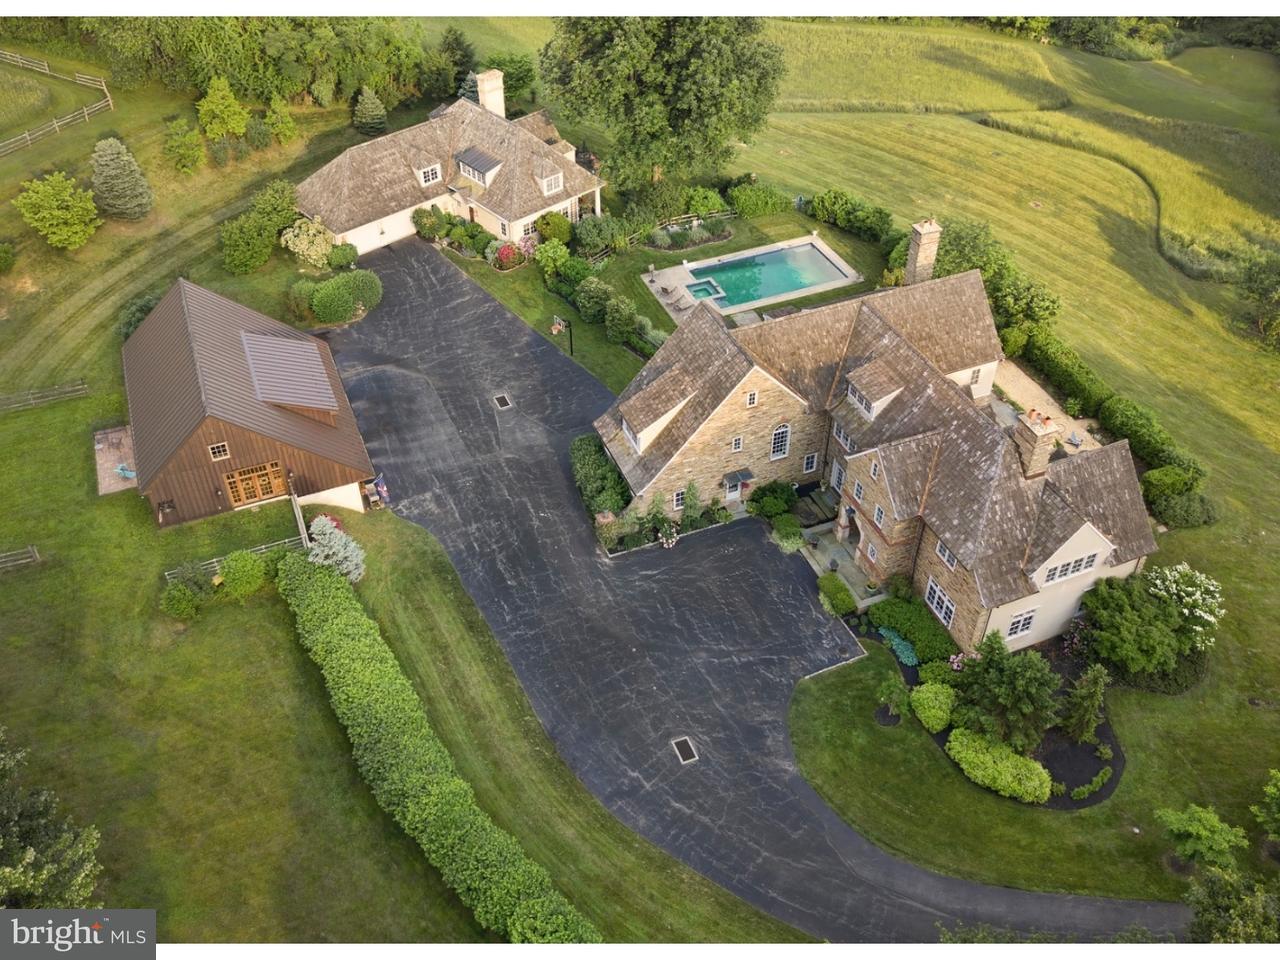 Single Family Home for Sale at 671 DARBY PAOLI Road Villanova, Pennsylvania 19085 United States